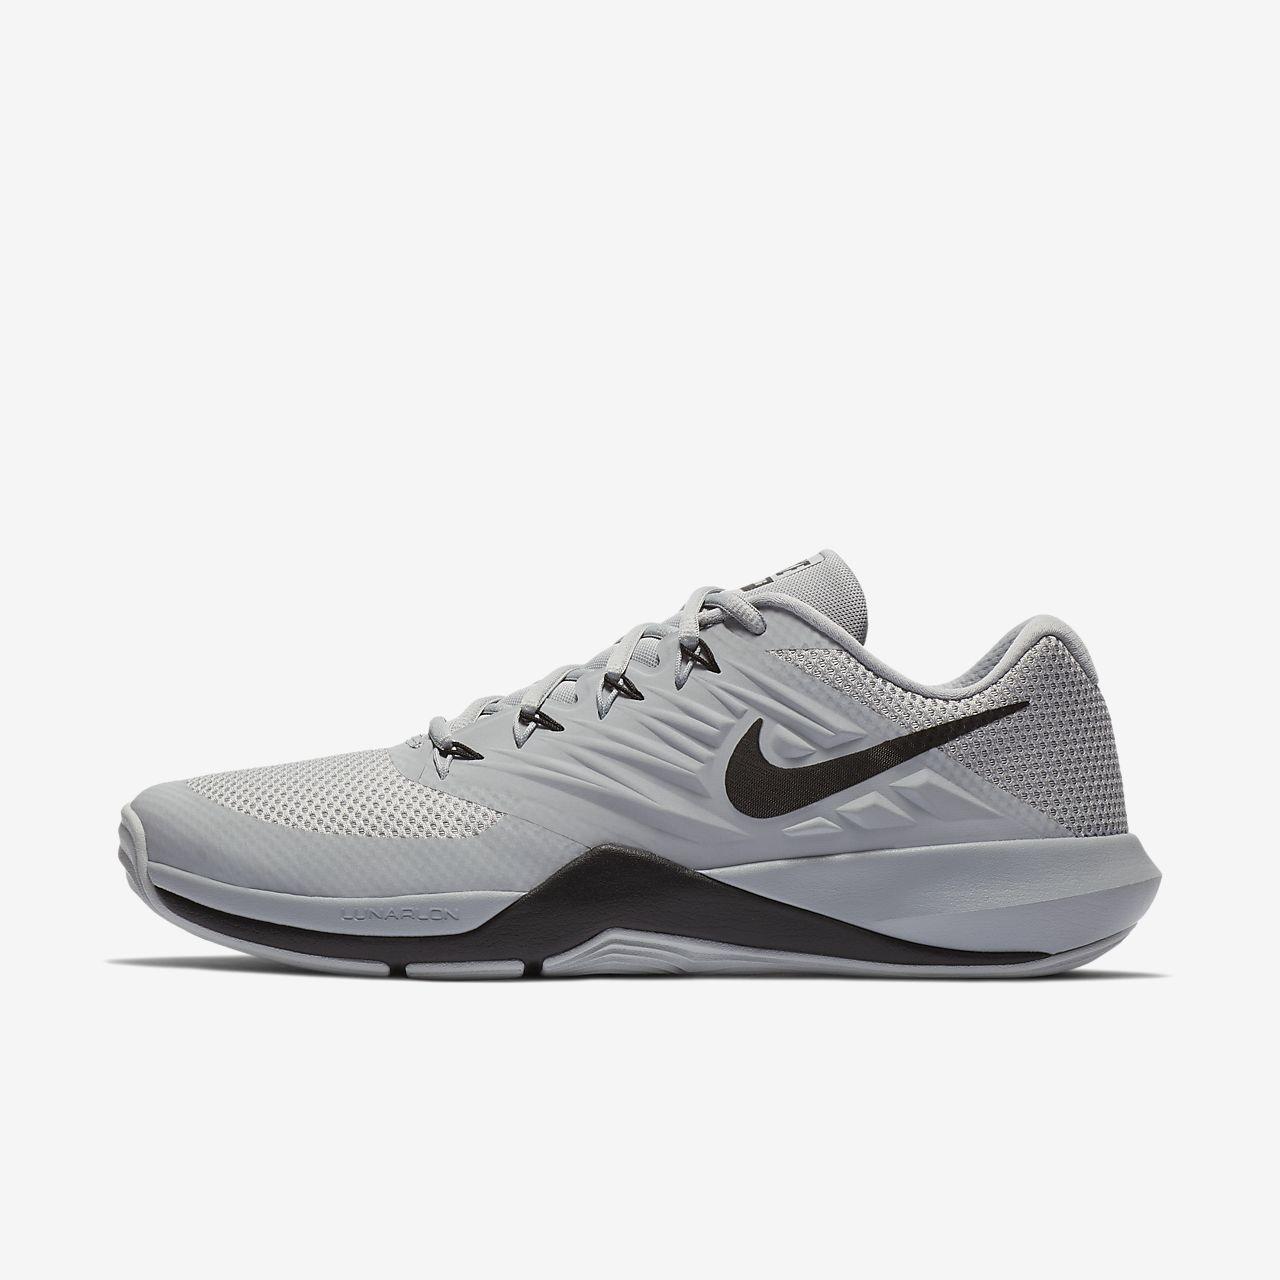 new concept 446fa 2f3af Nike Lunar Prime Iron II